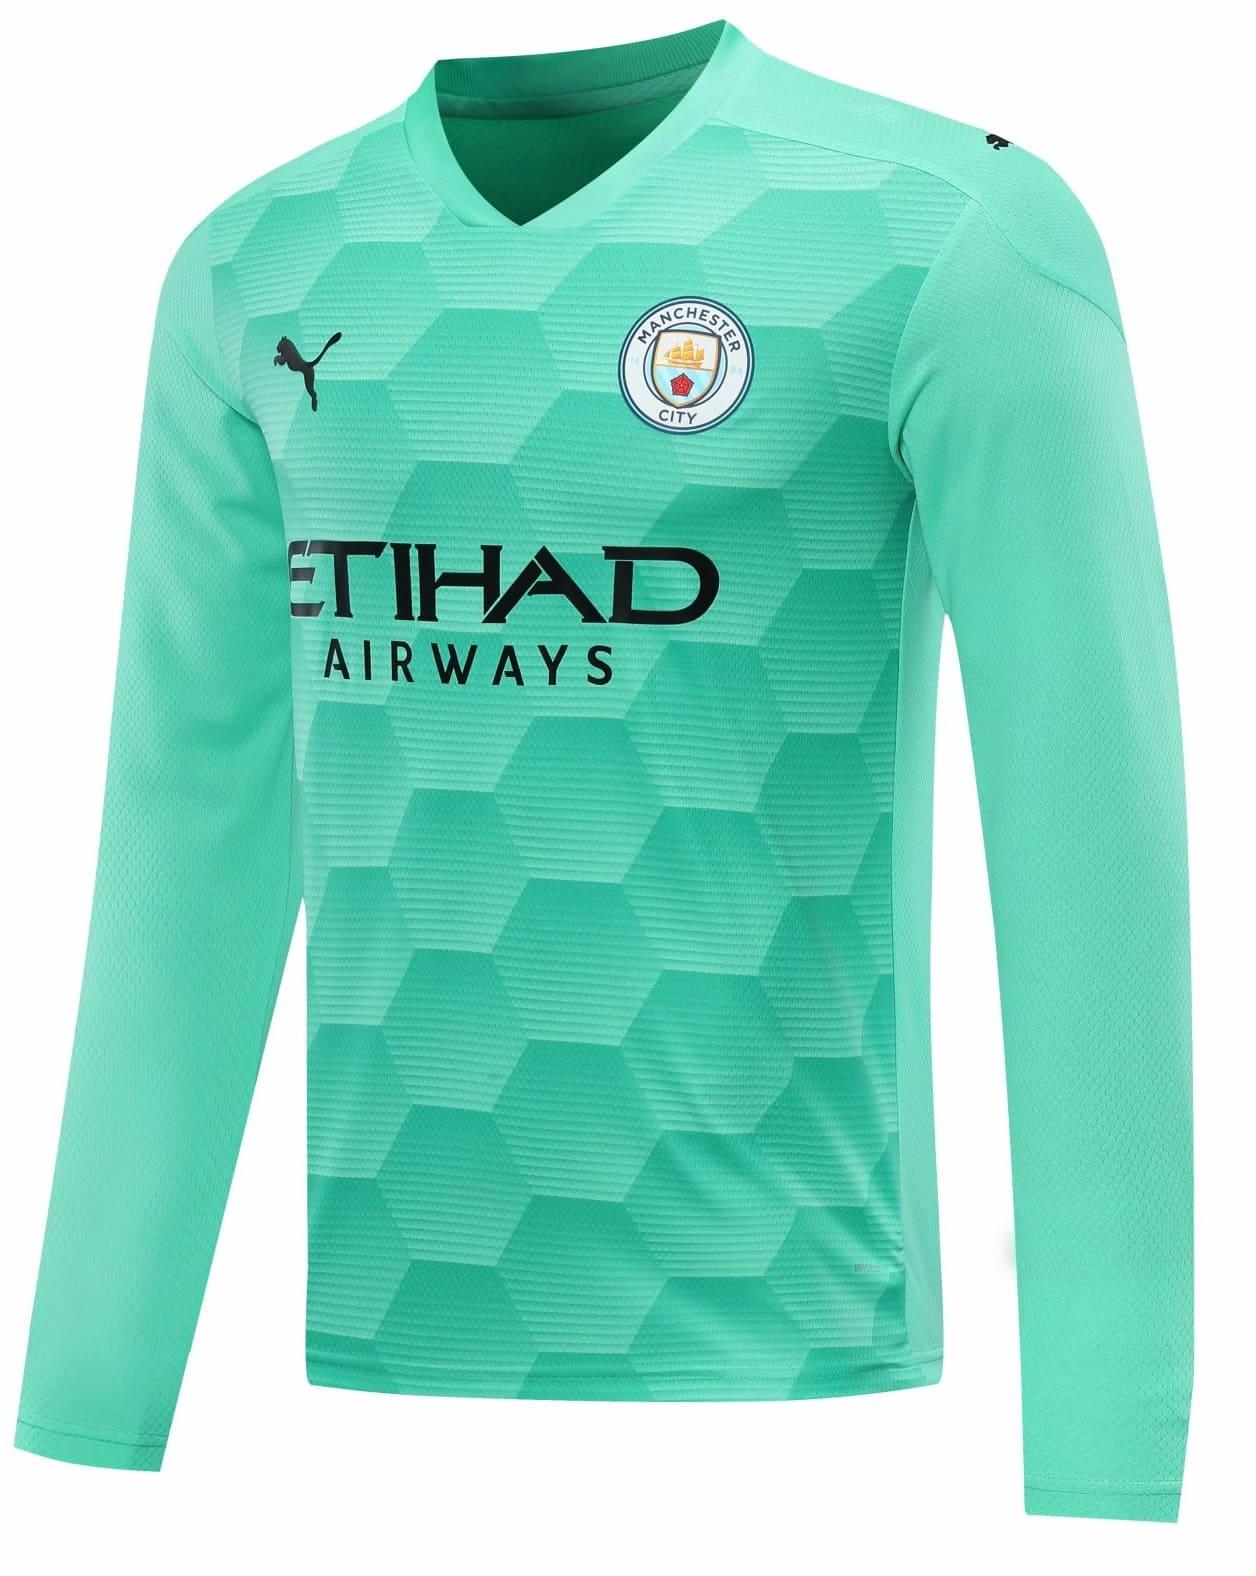 Camisa Manga Longa Manchester City 2021 Uniforme Goleiro Dry Cell